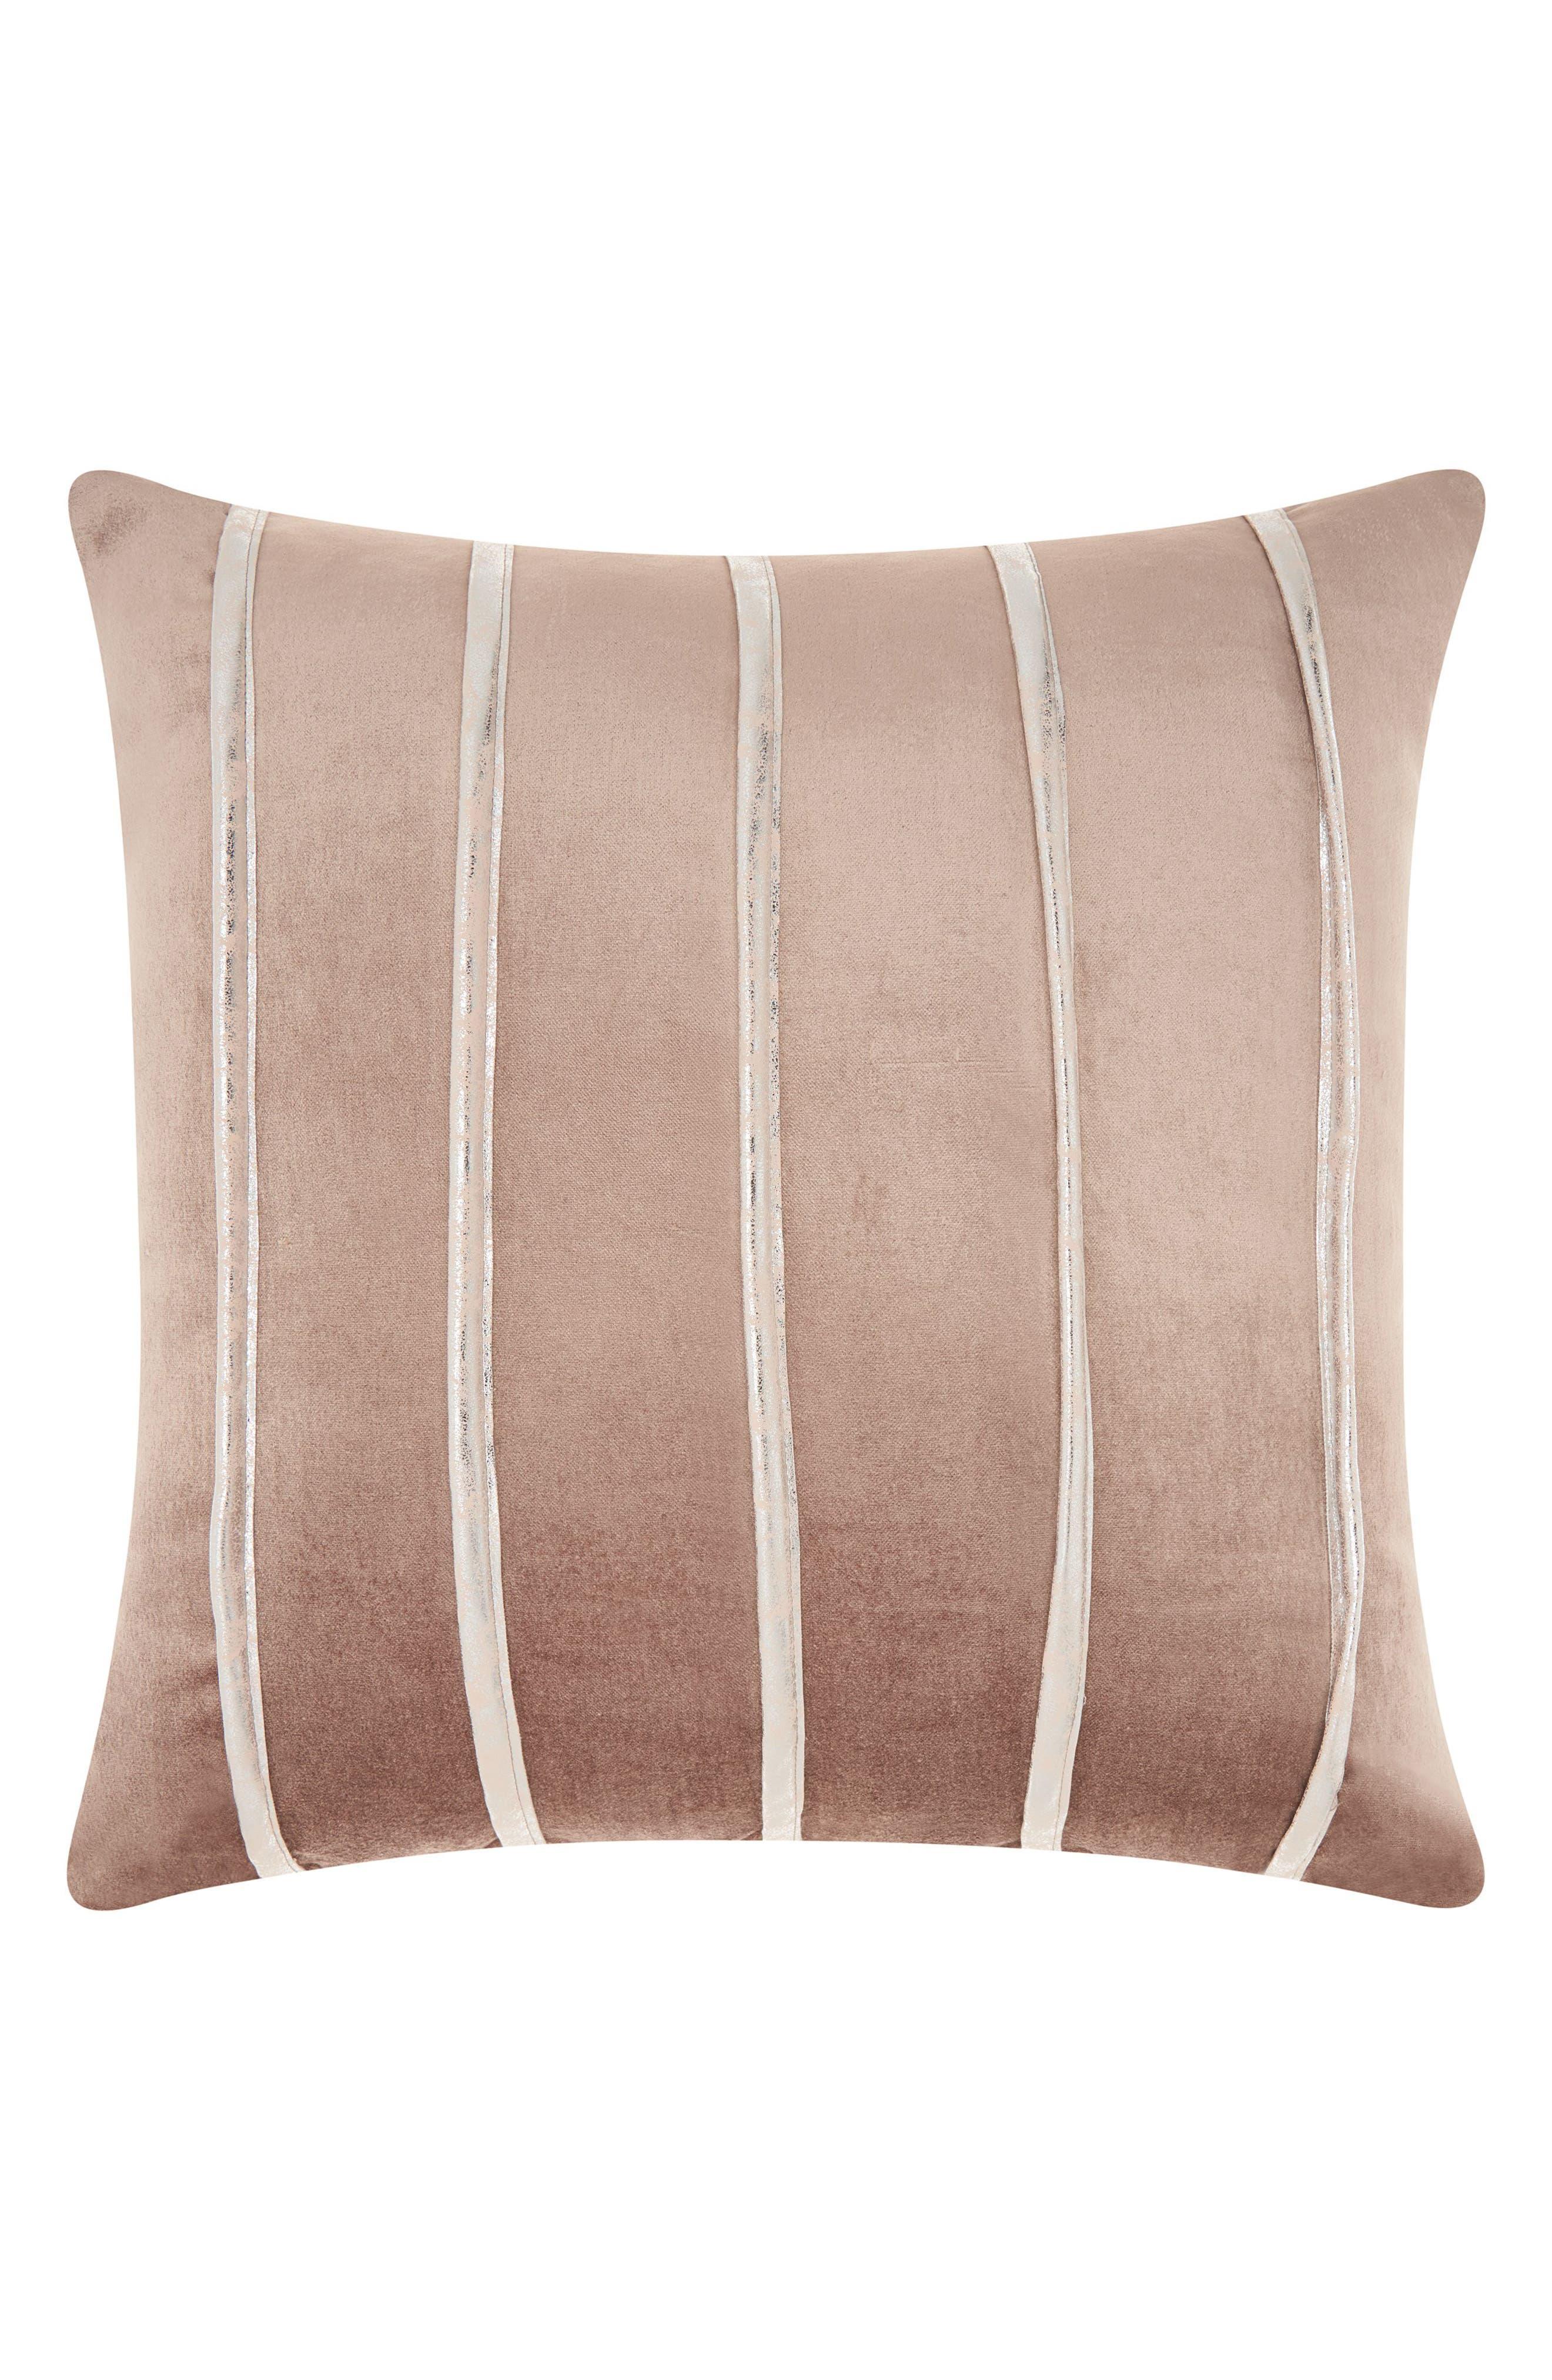 Main Image - Mina Victory Stripe Velvet Accent Pillow